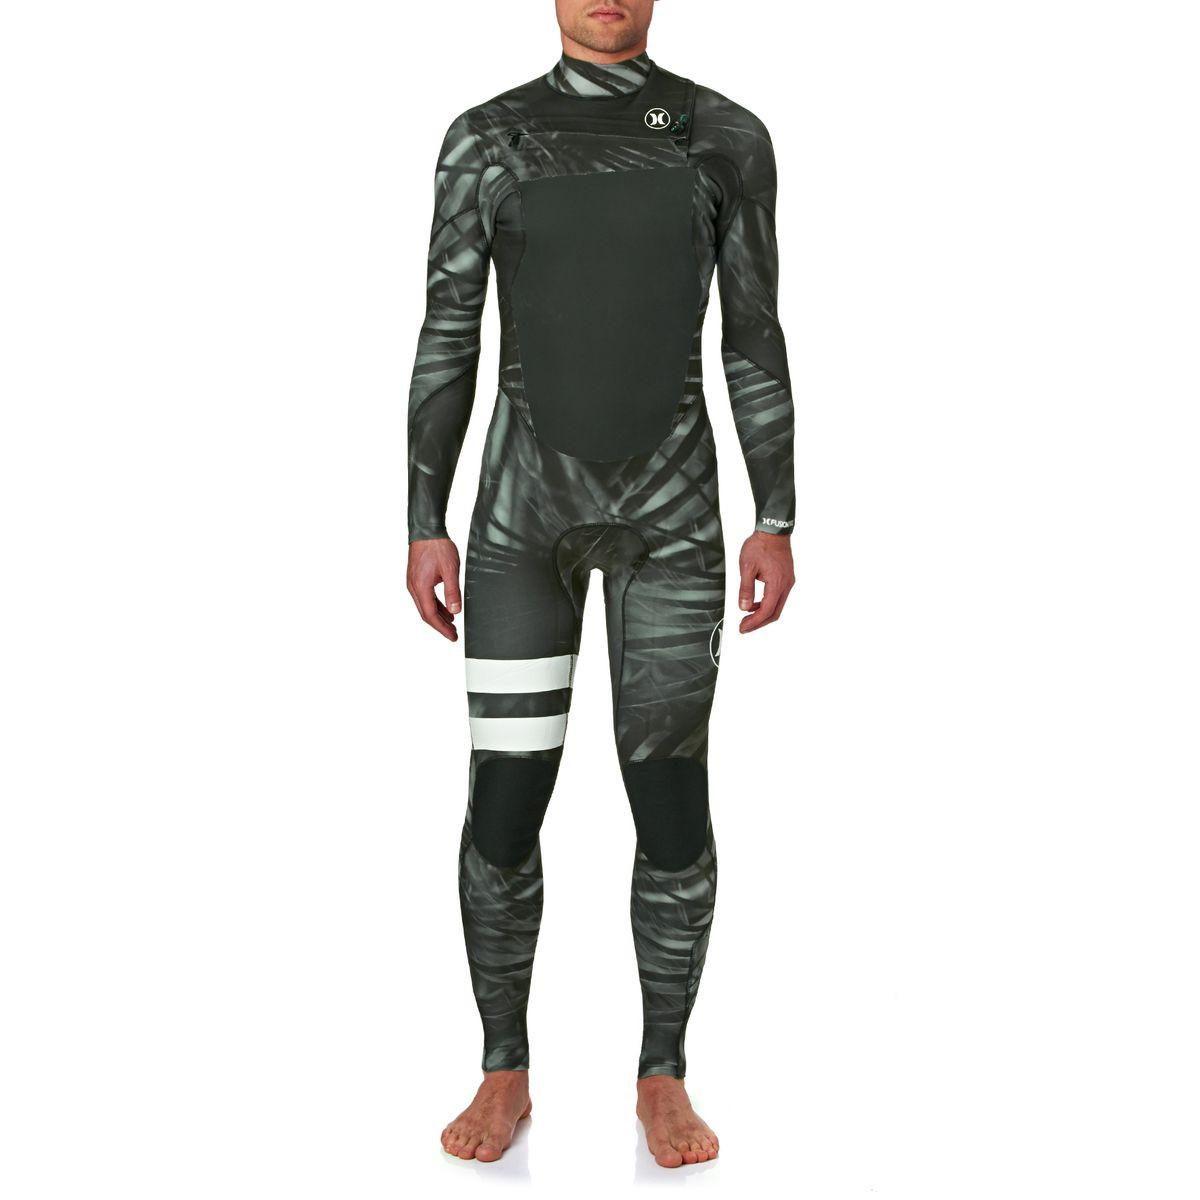 Hurley Fusion 3/2mm 2017 Chest Zip Wetsuit - Black Camo